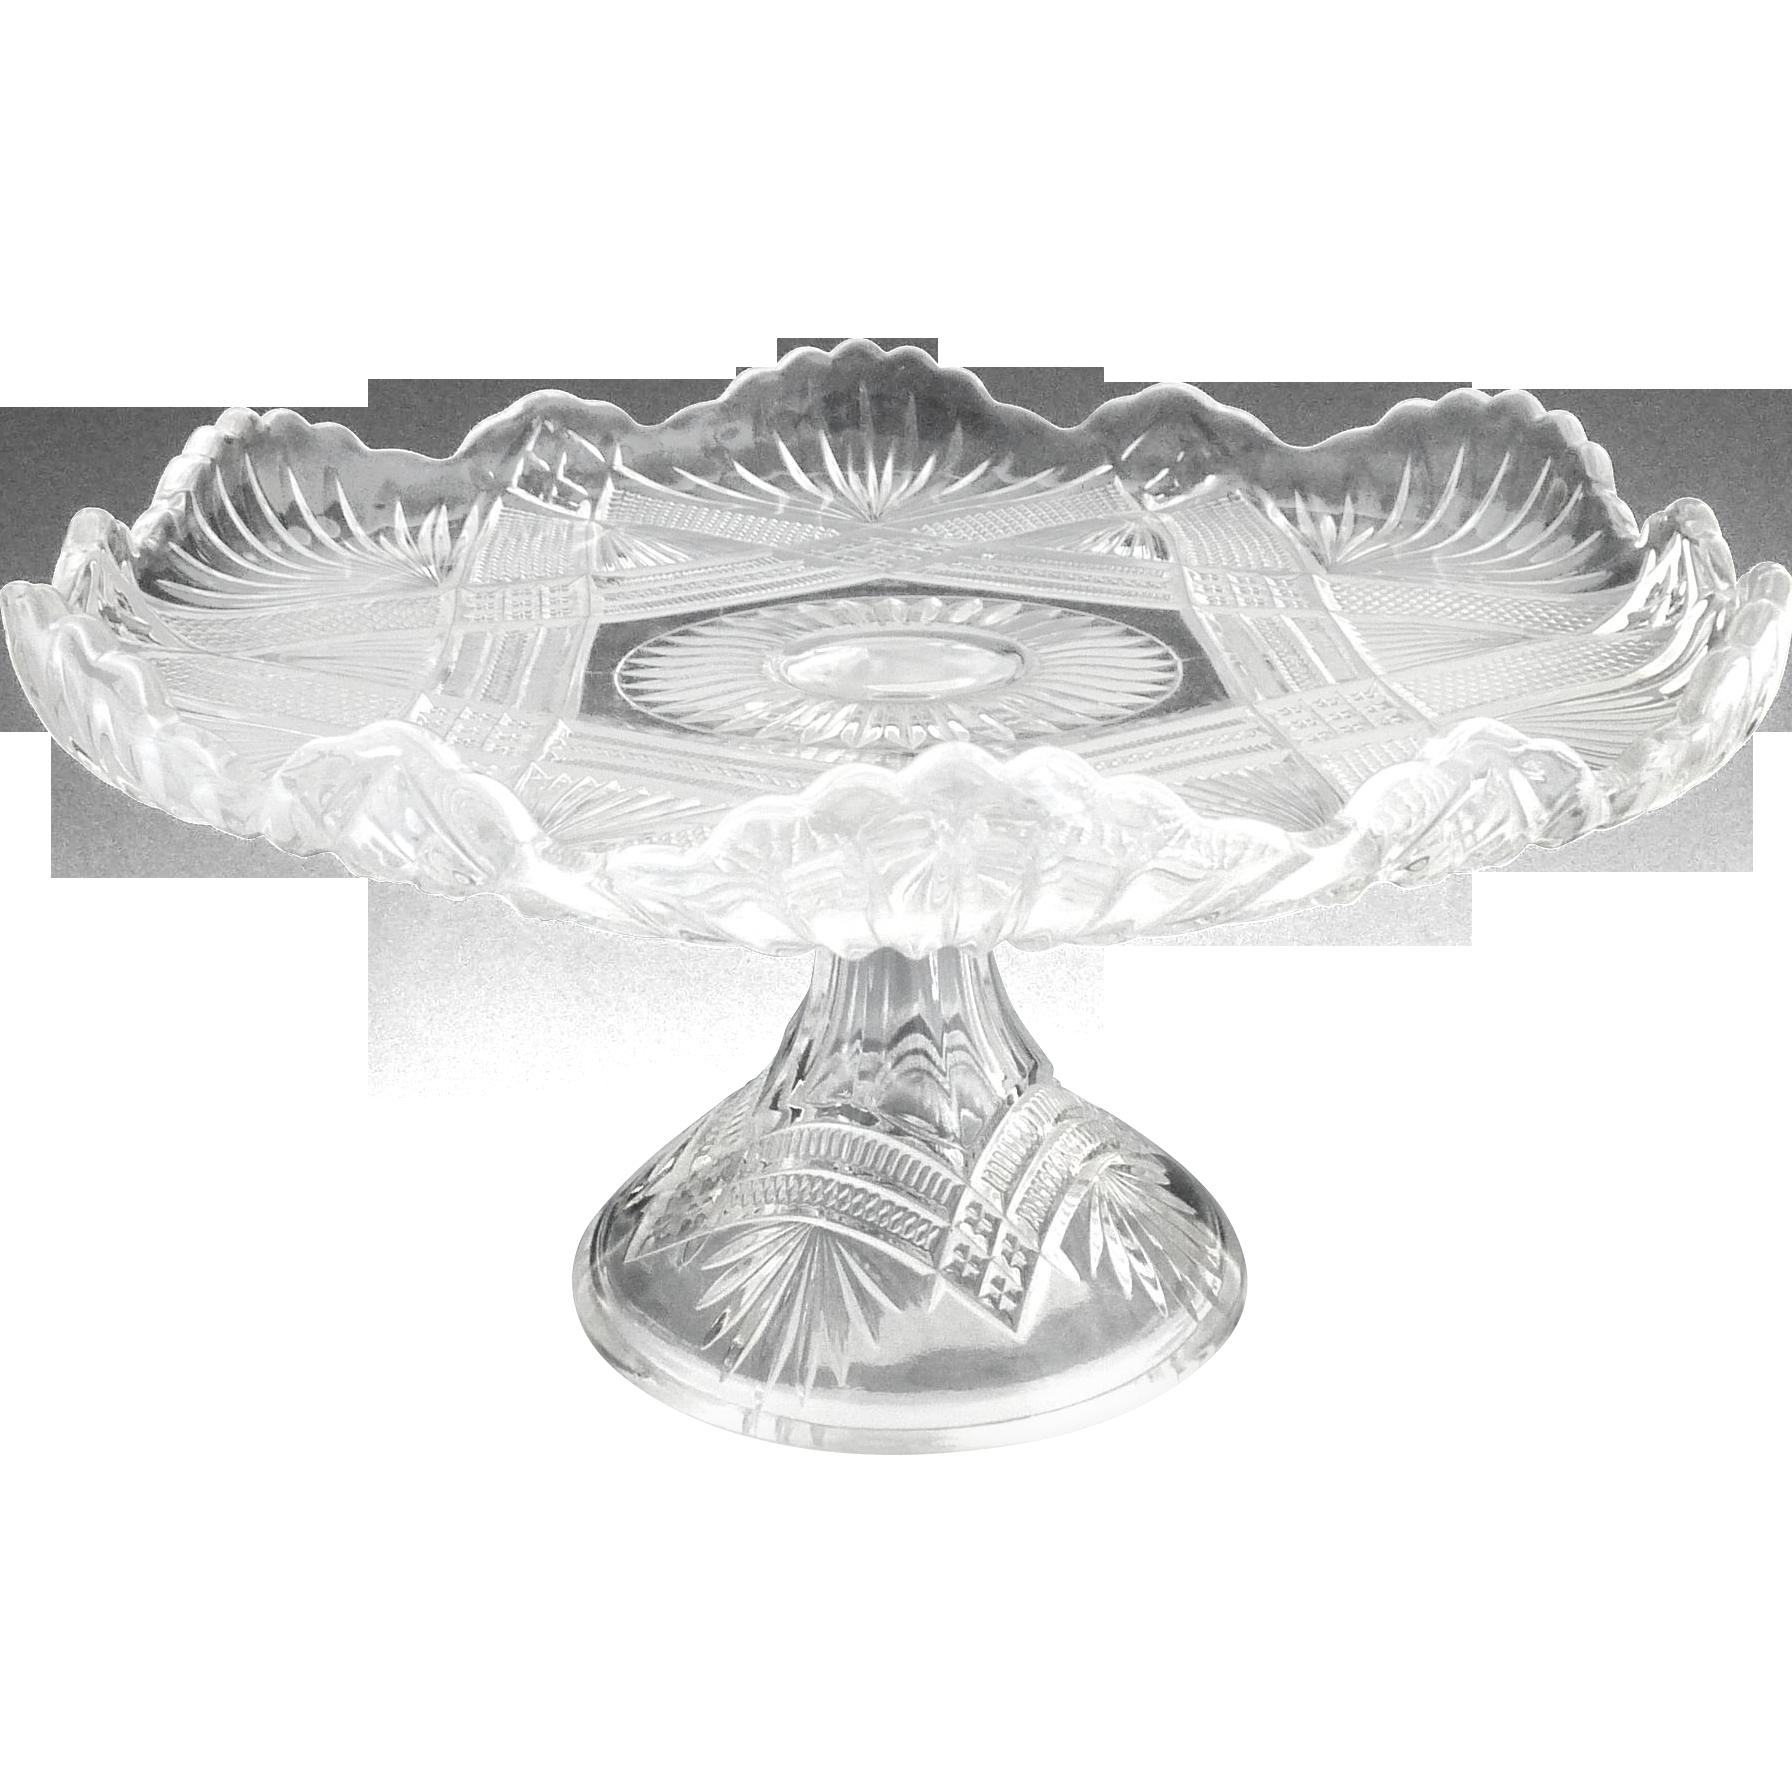 Duncan EAPG cake salver TeePee Wigwam c. 1896